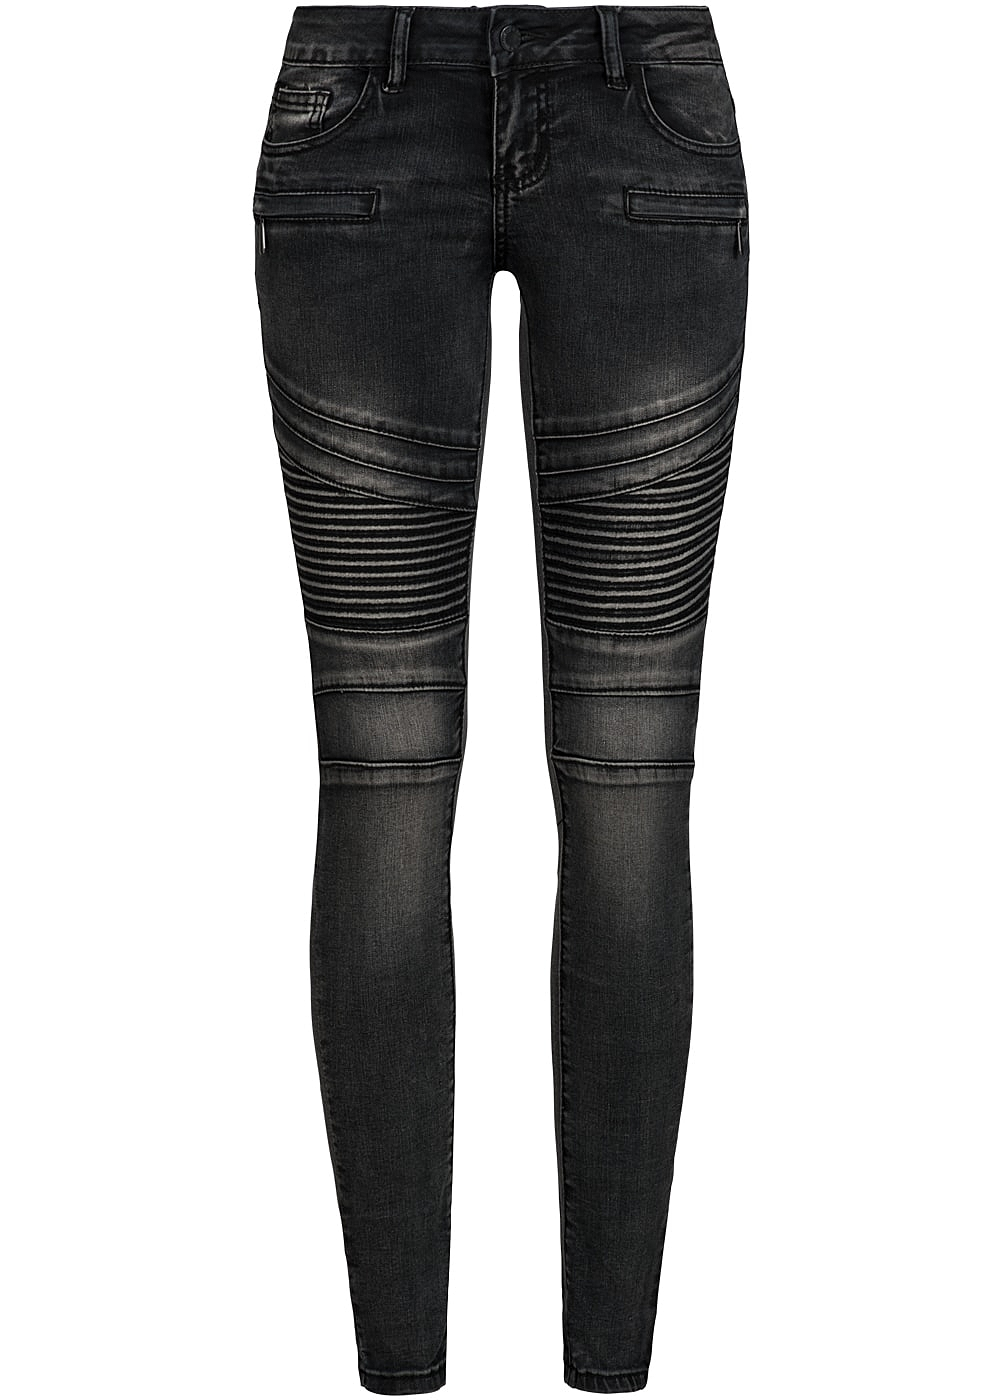 Jeans hose schwarz damen